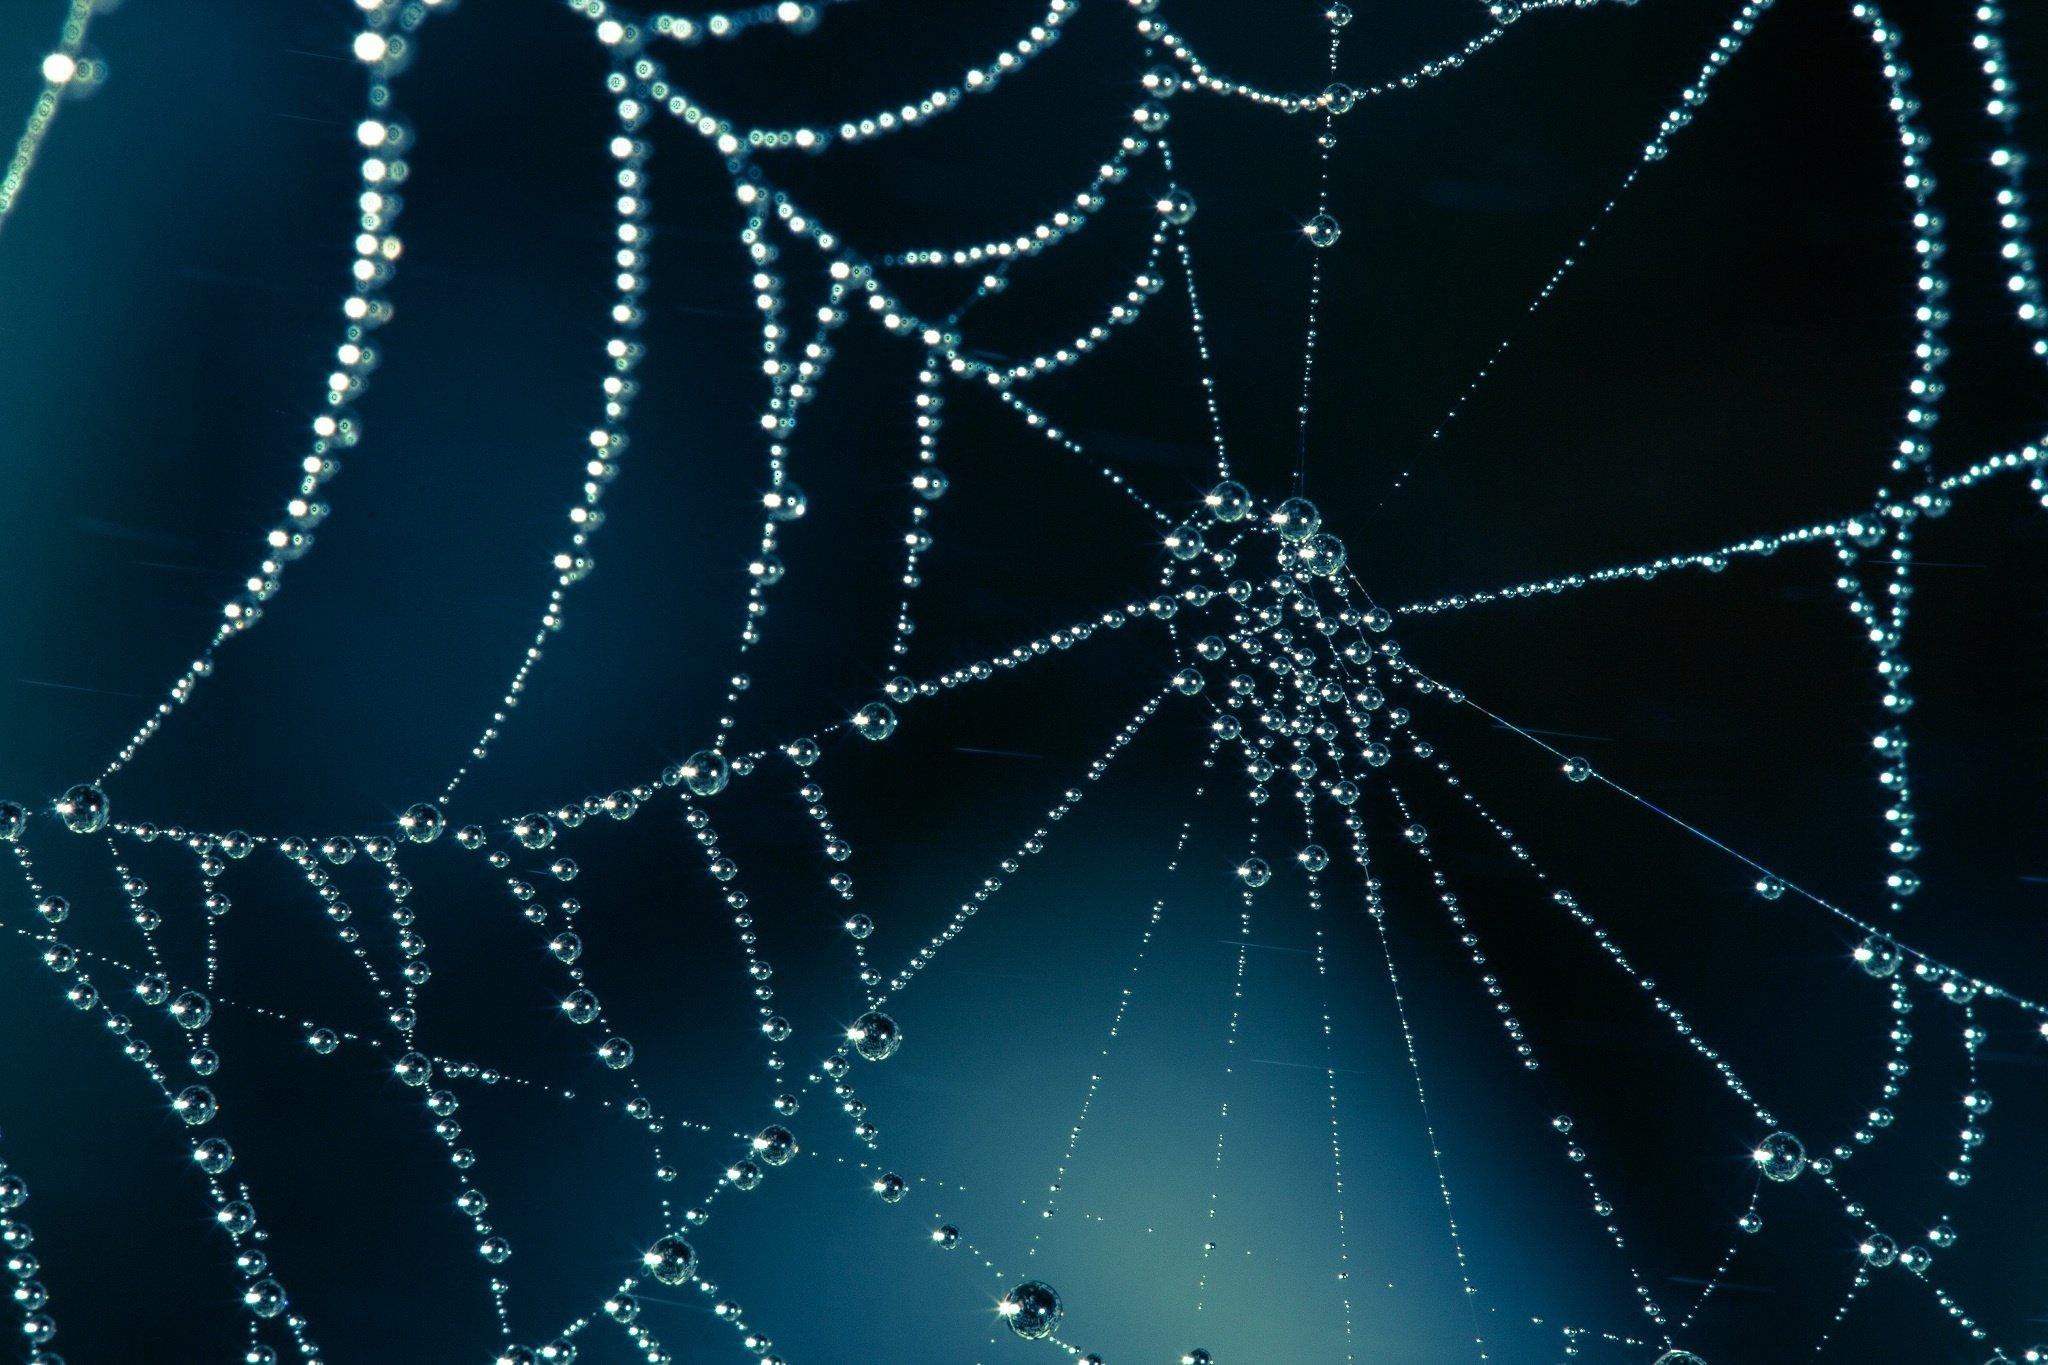 web drops macro shiny bokeh spider spiderweb wallpaper background 2048x1365